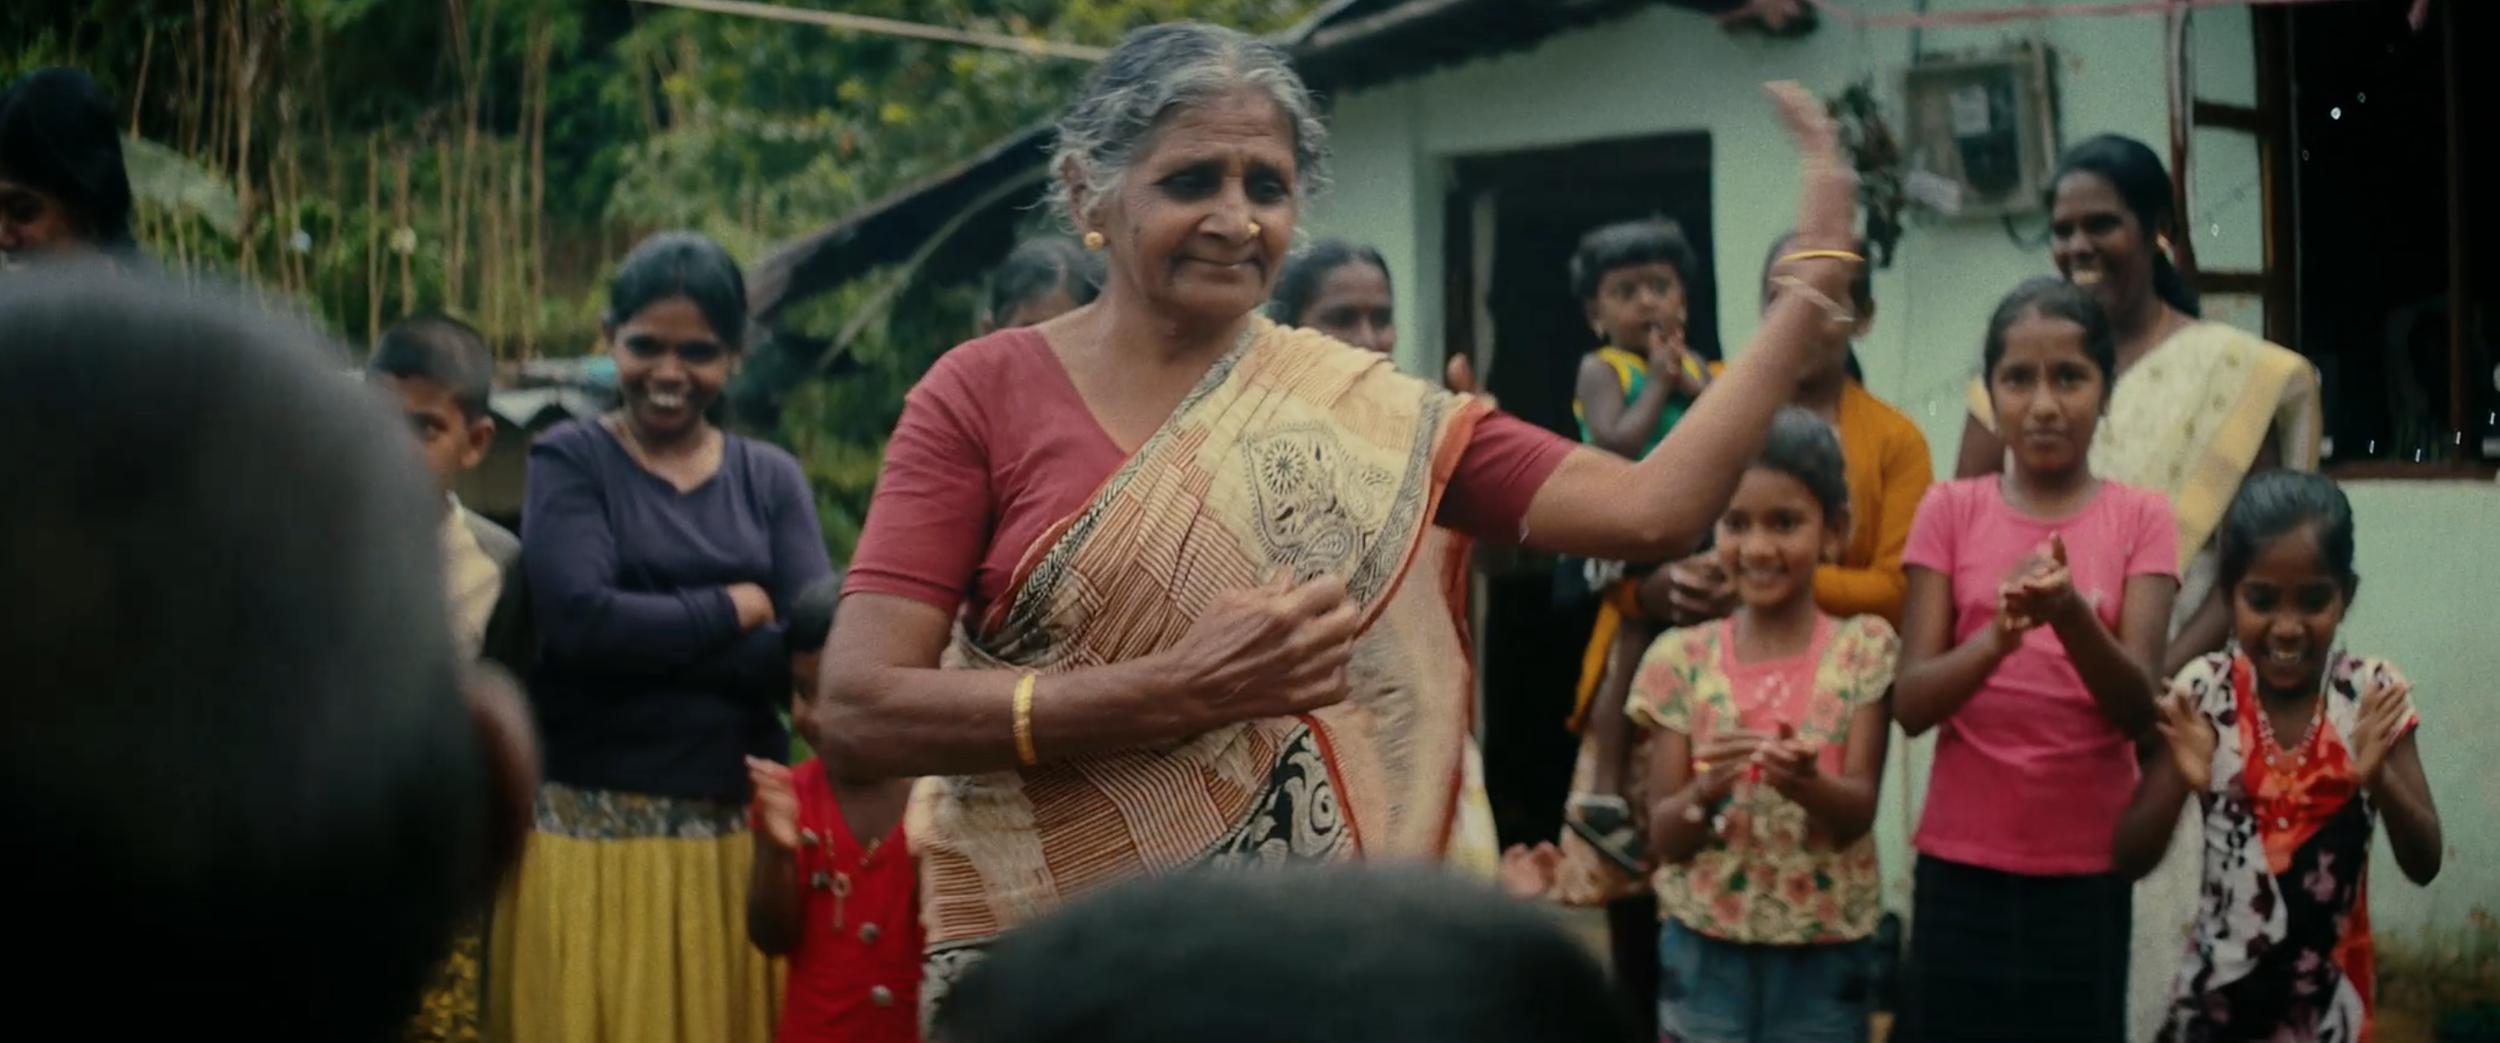 BLKFLM_VanessaBlack_SriLanka_Vogue_GapIncScreen Shot 2017-02-13 at 12.20.12 PM.png